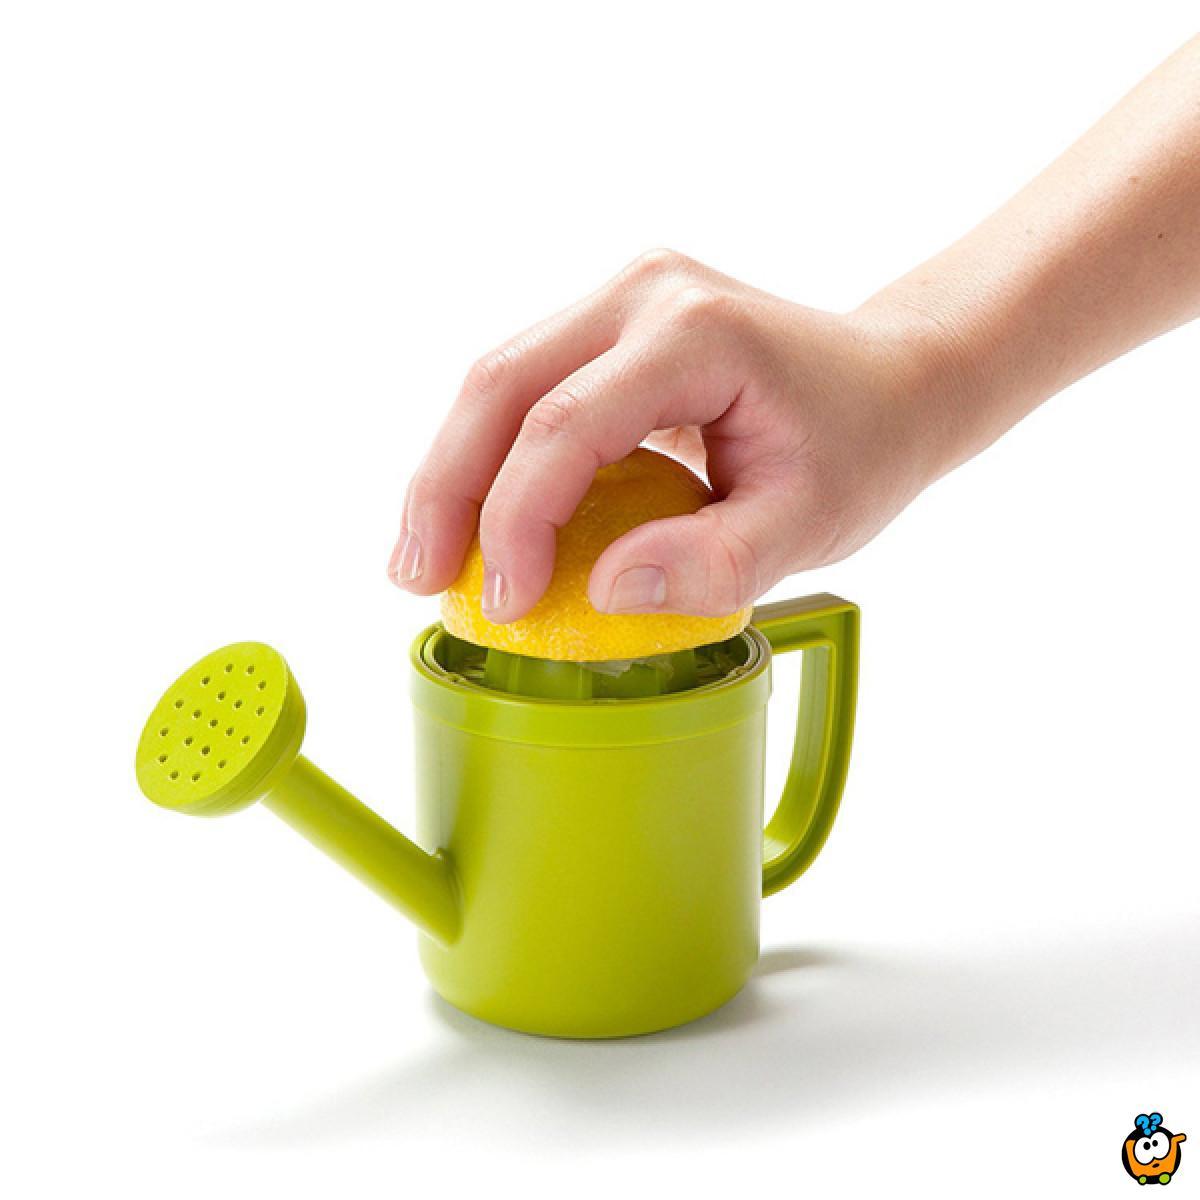 Lemon juicer - cediljka za limun